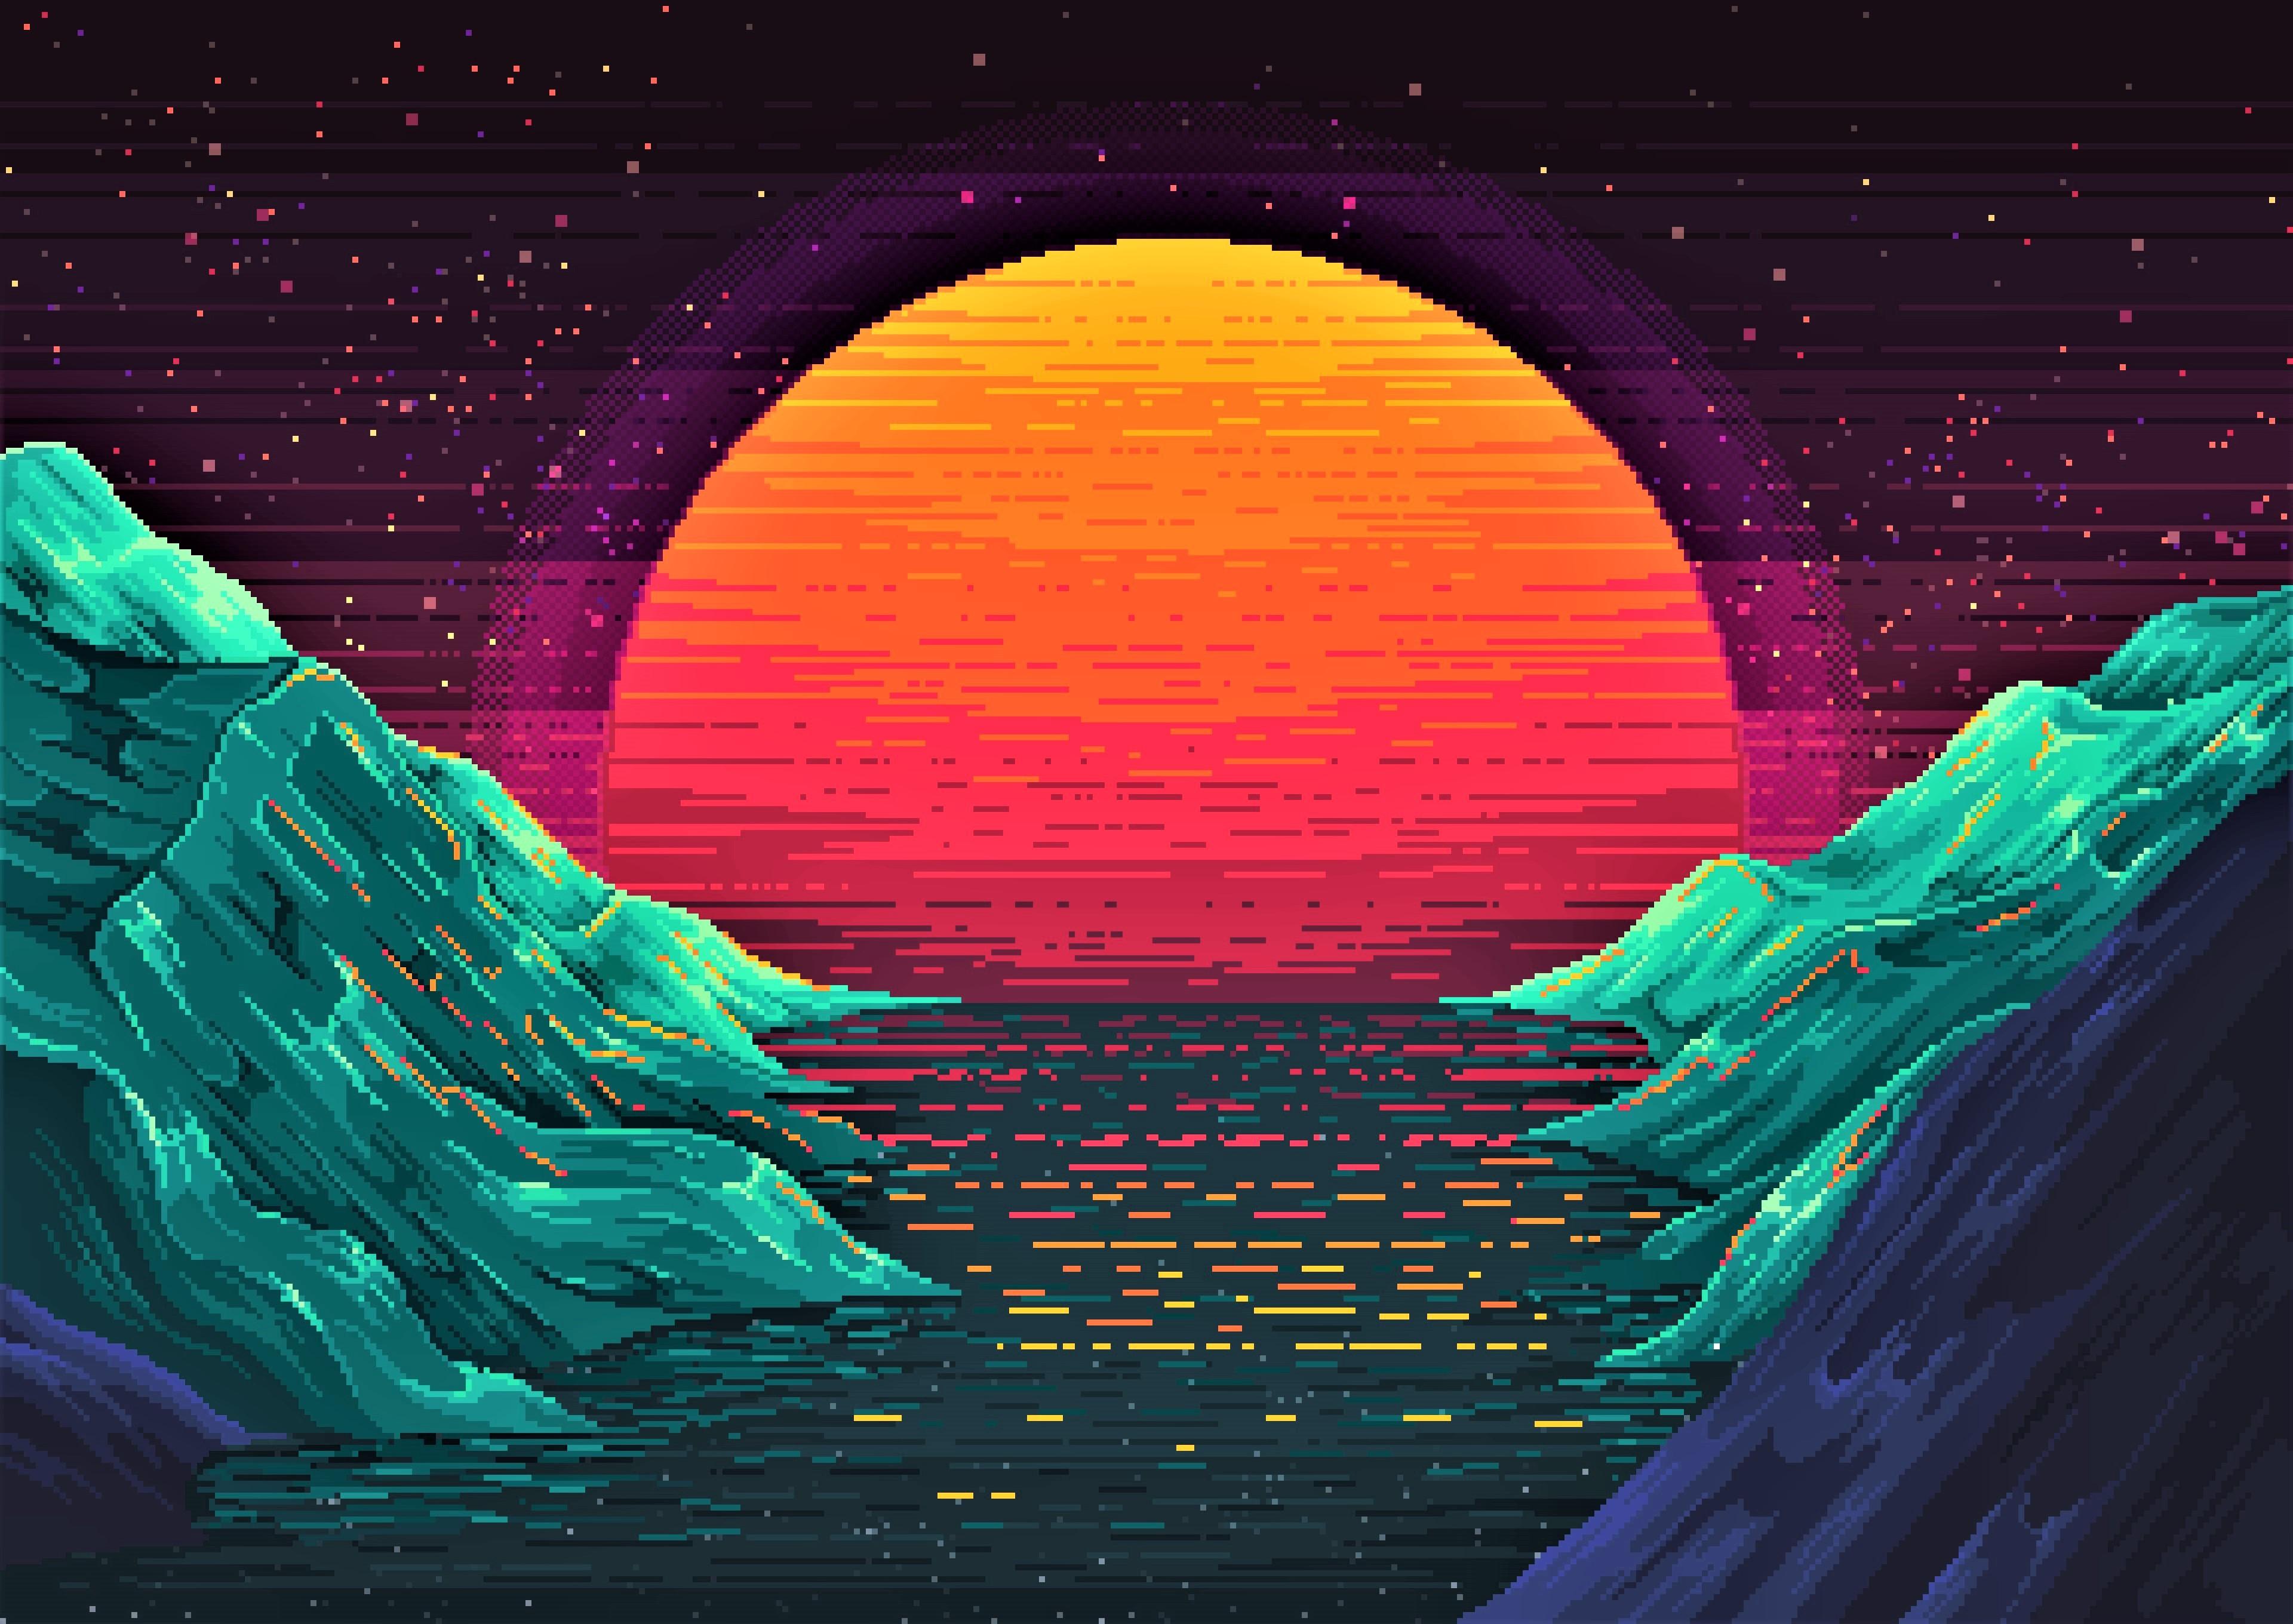 Neon Landscape 4k Ultra Hd Wallpaper Background Image 3840x2720 Id 937990 Wallpaper Abyss